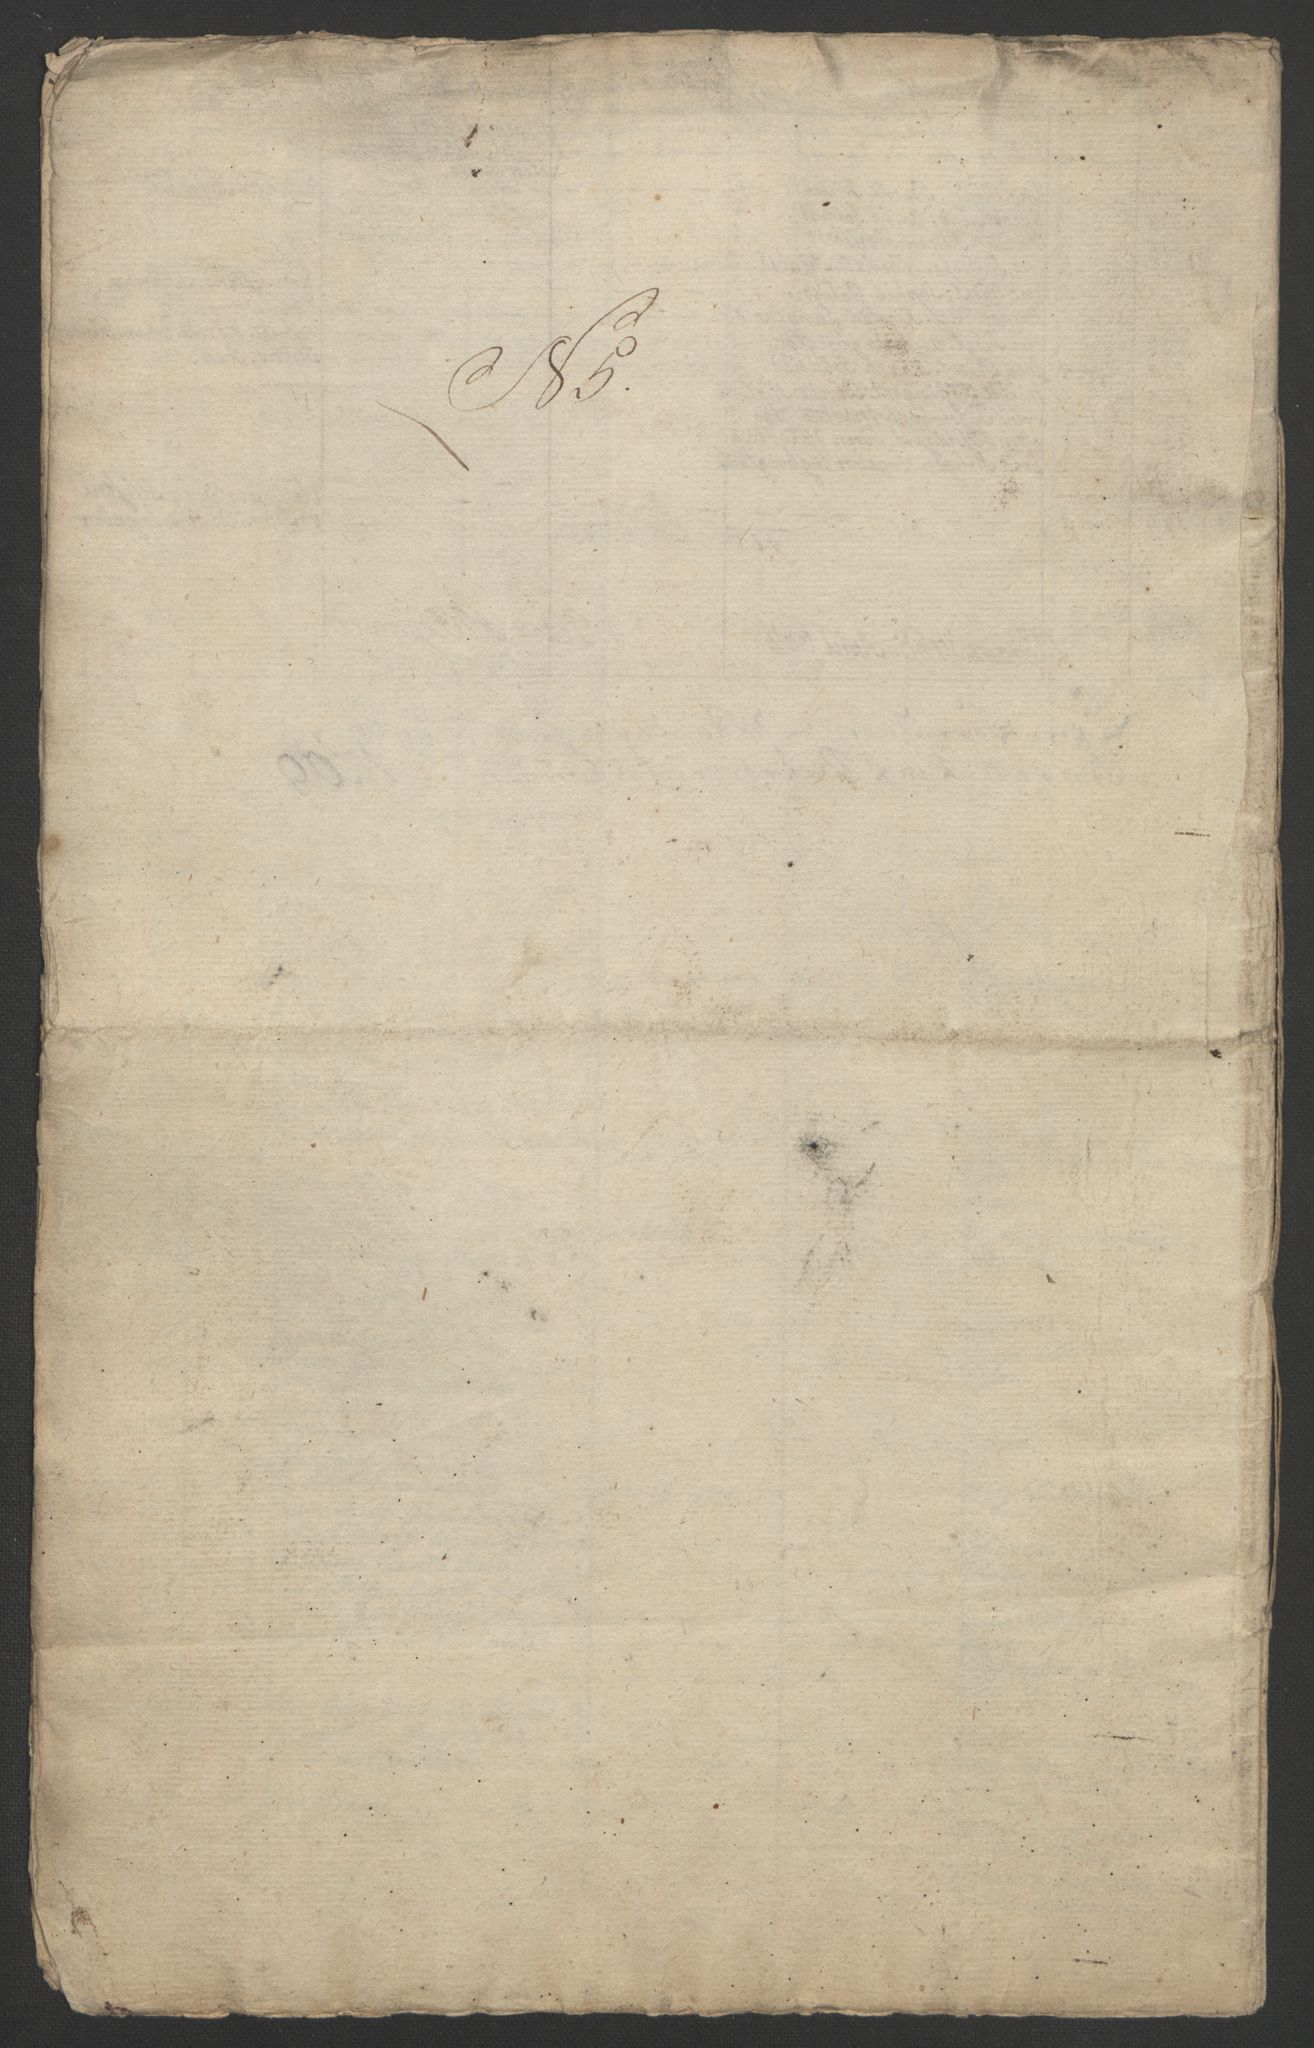 RA, Rentekammeret inntil 1814, Realistisk ordnet avdeling, Ol/L0021: [Gg 10]: Ekstraskatten, 23.09.1762. Orkdal og Gauldal, 1762-1767, s. 566